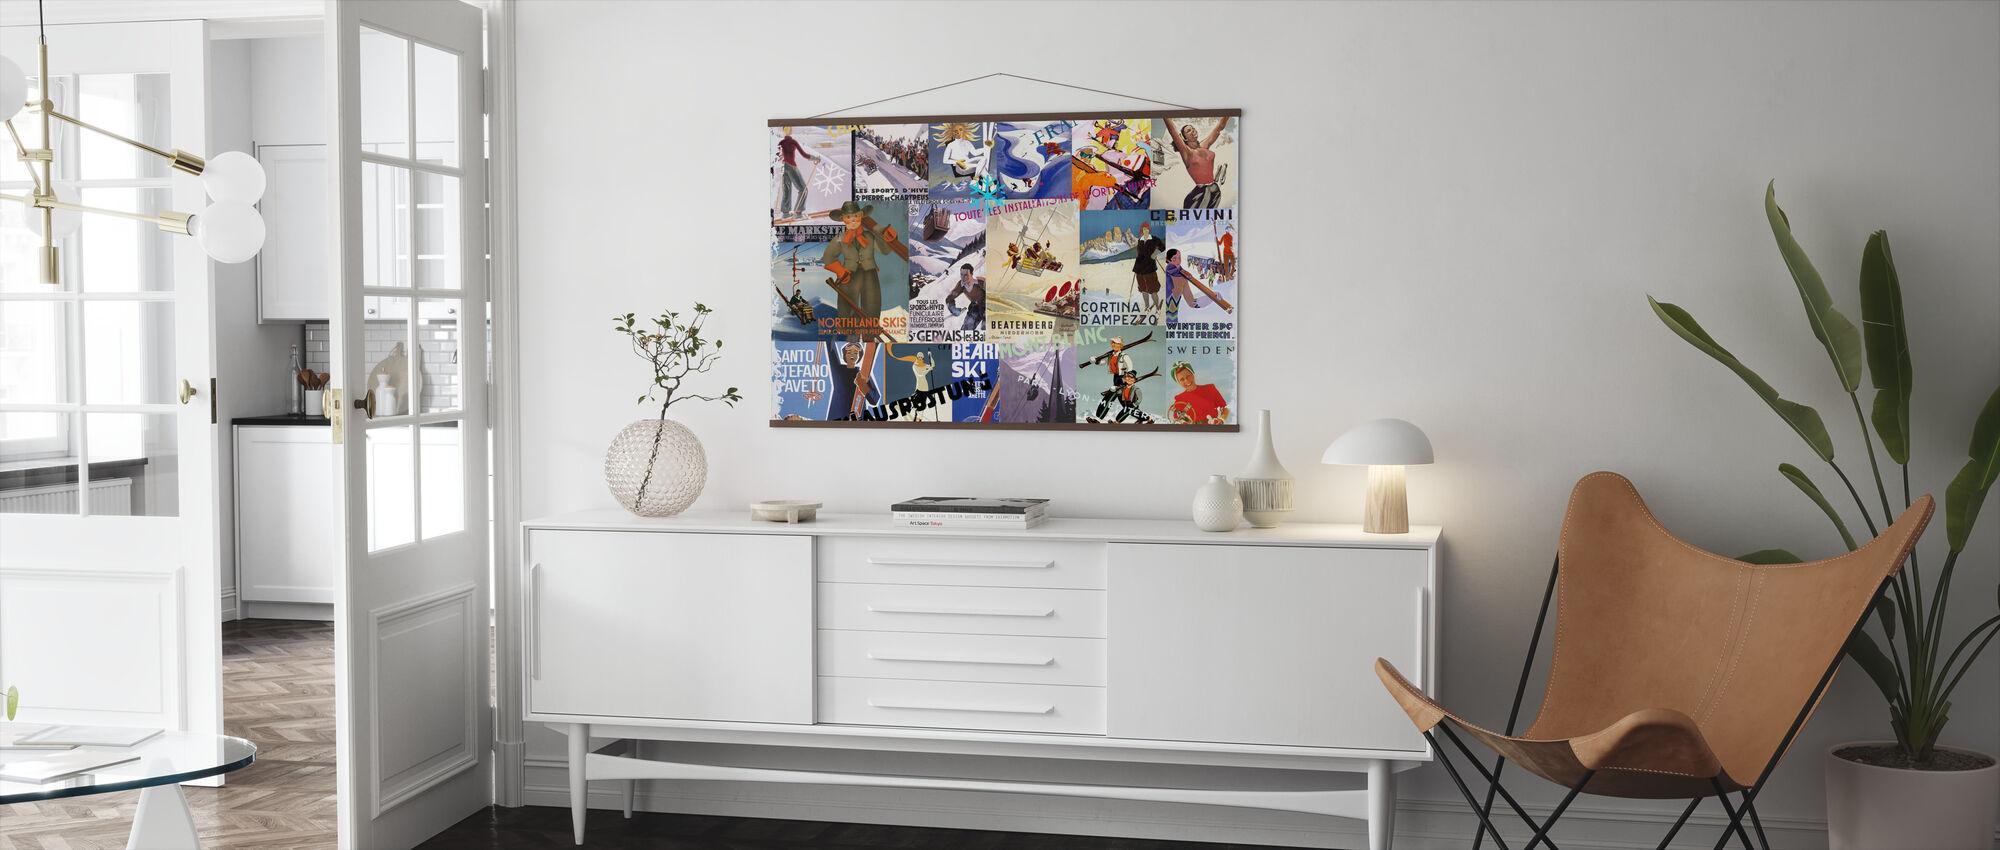 Skidorter Collage - Poster - Vardagsrum